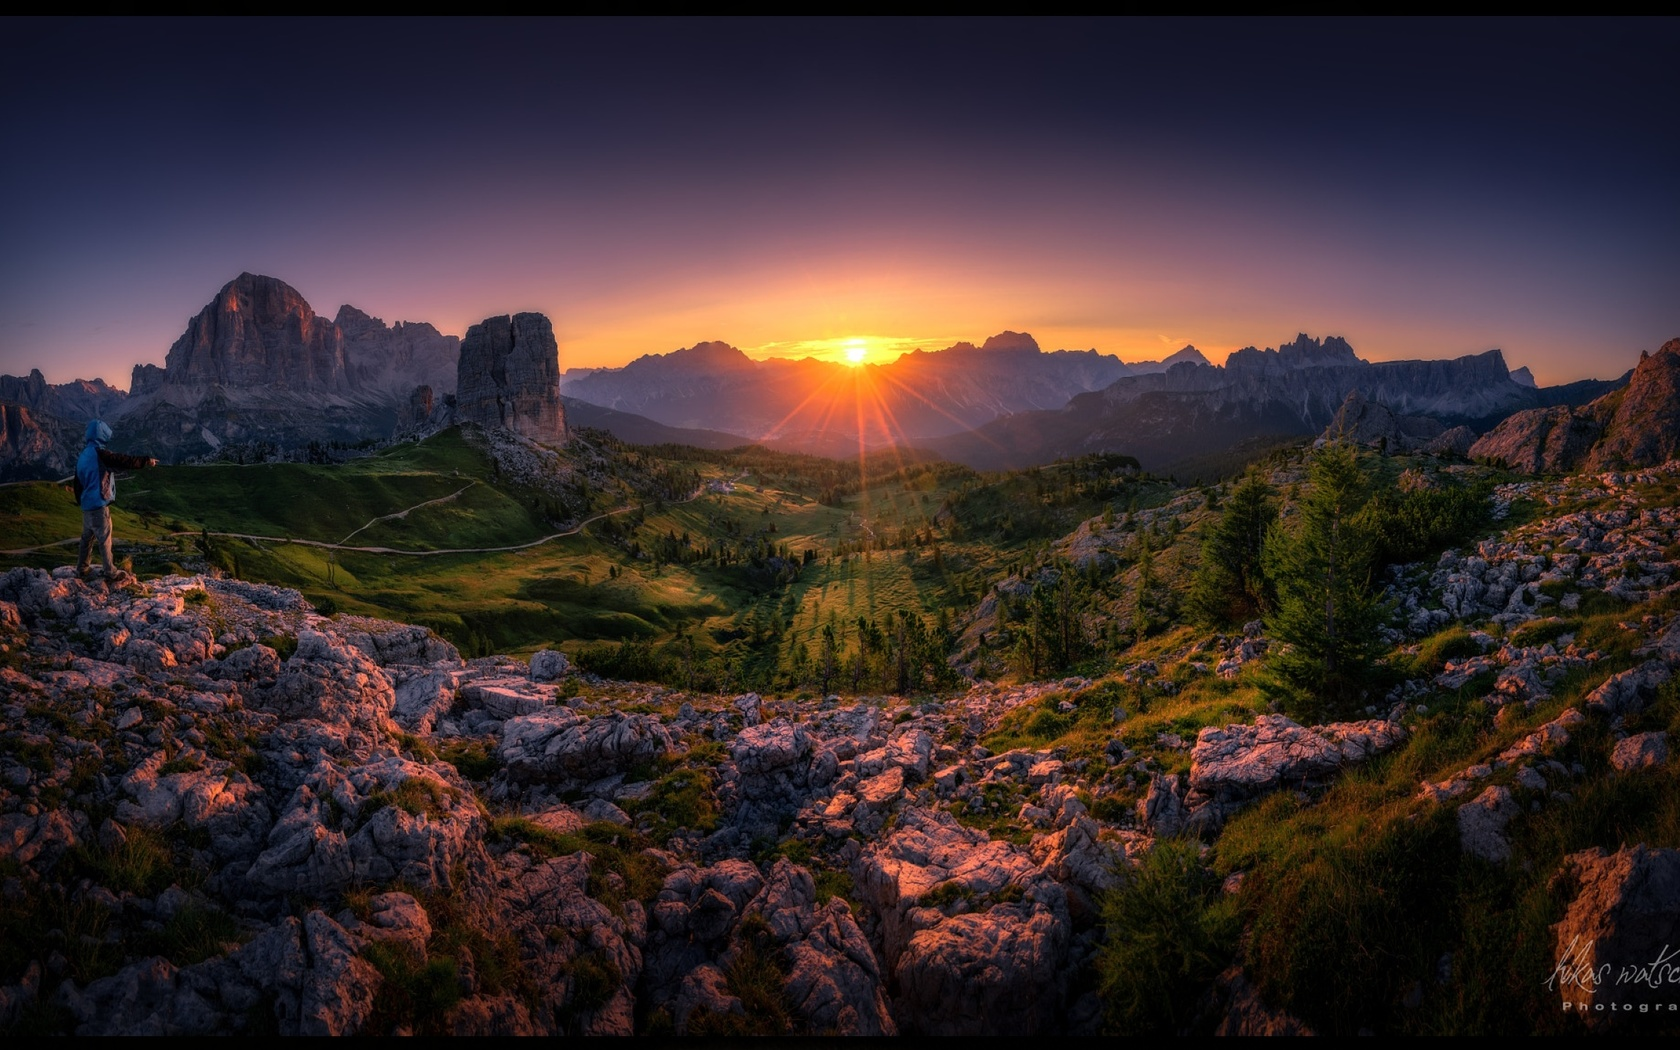 скалы, заходо солнца, by lukas watschinger обои для рабочего стола